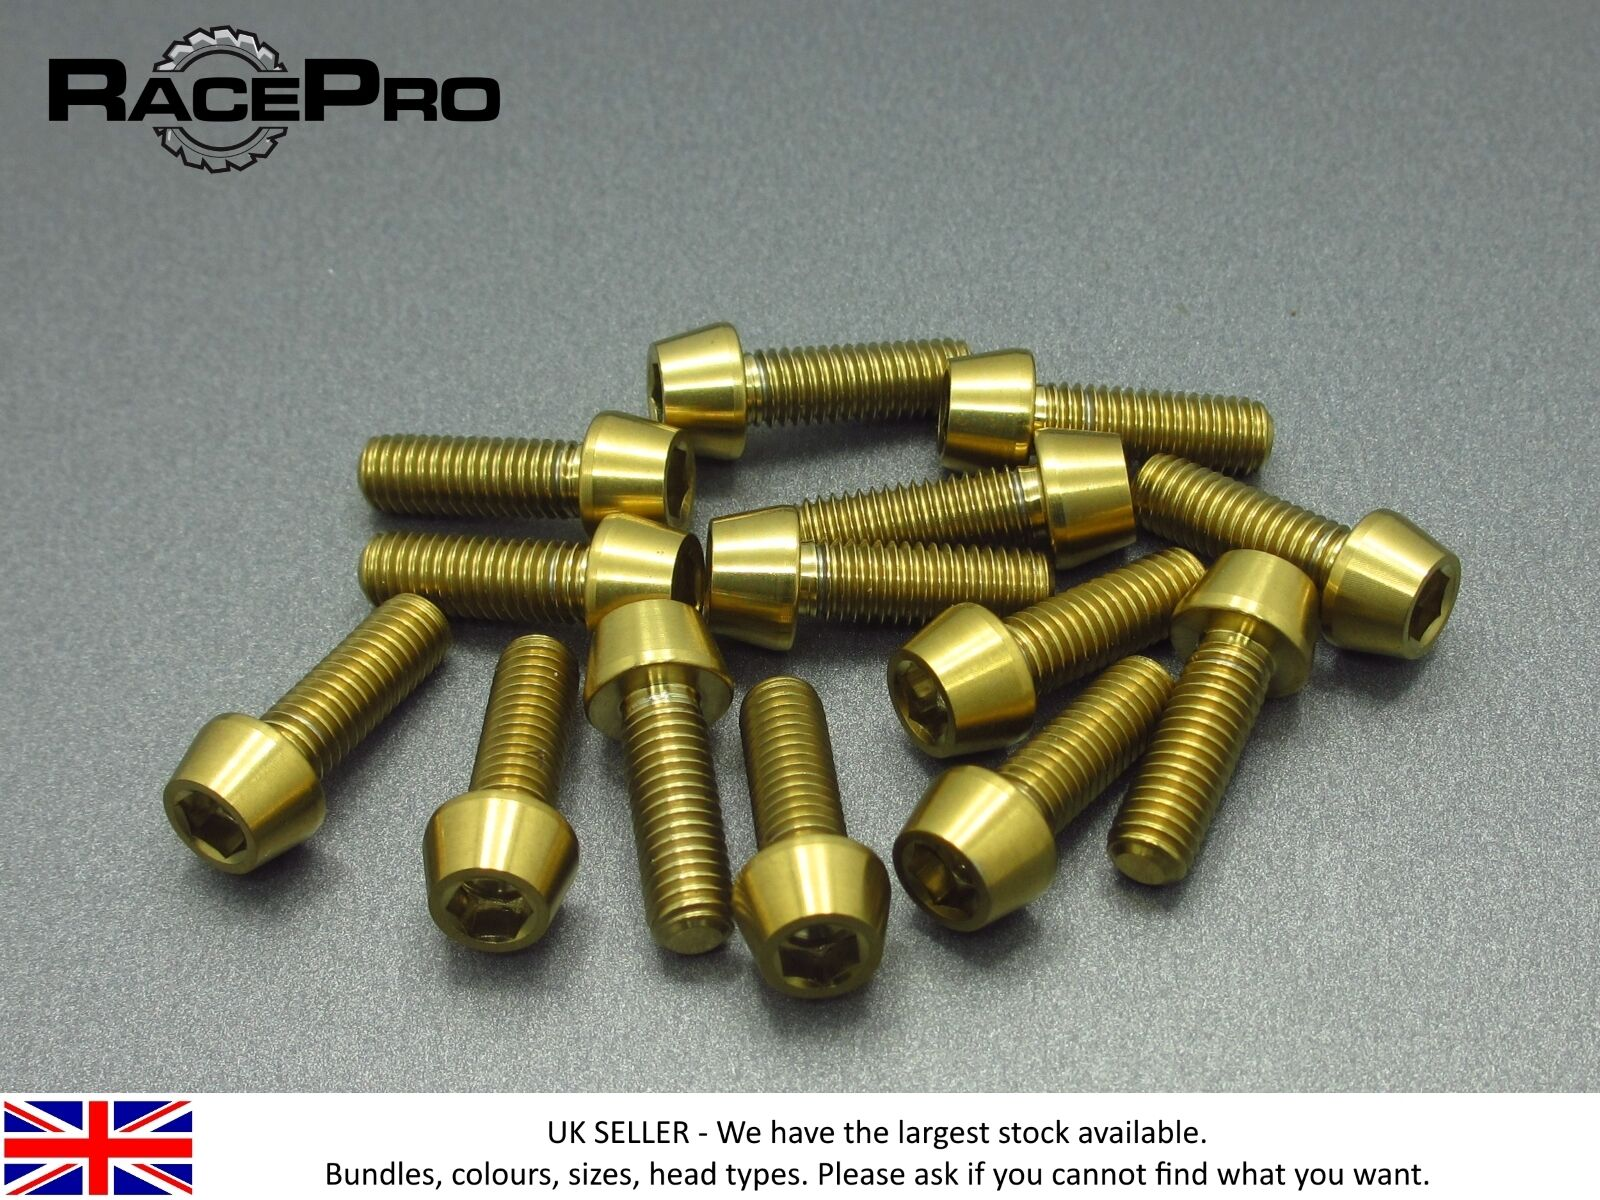 RacePro 20 x Titan Konusbolzen GR5 M6 x  20mm x 1mm Innensechskantschraube gold  up to 50% off